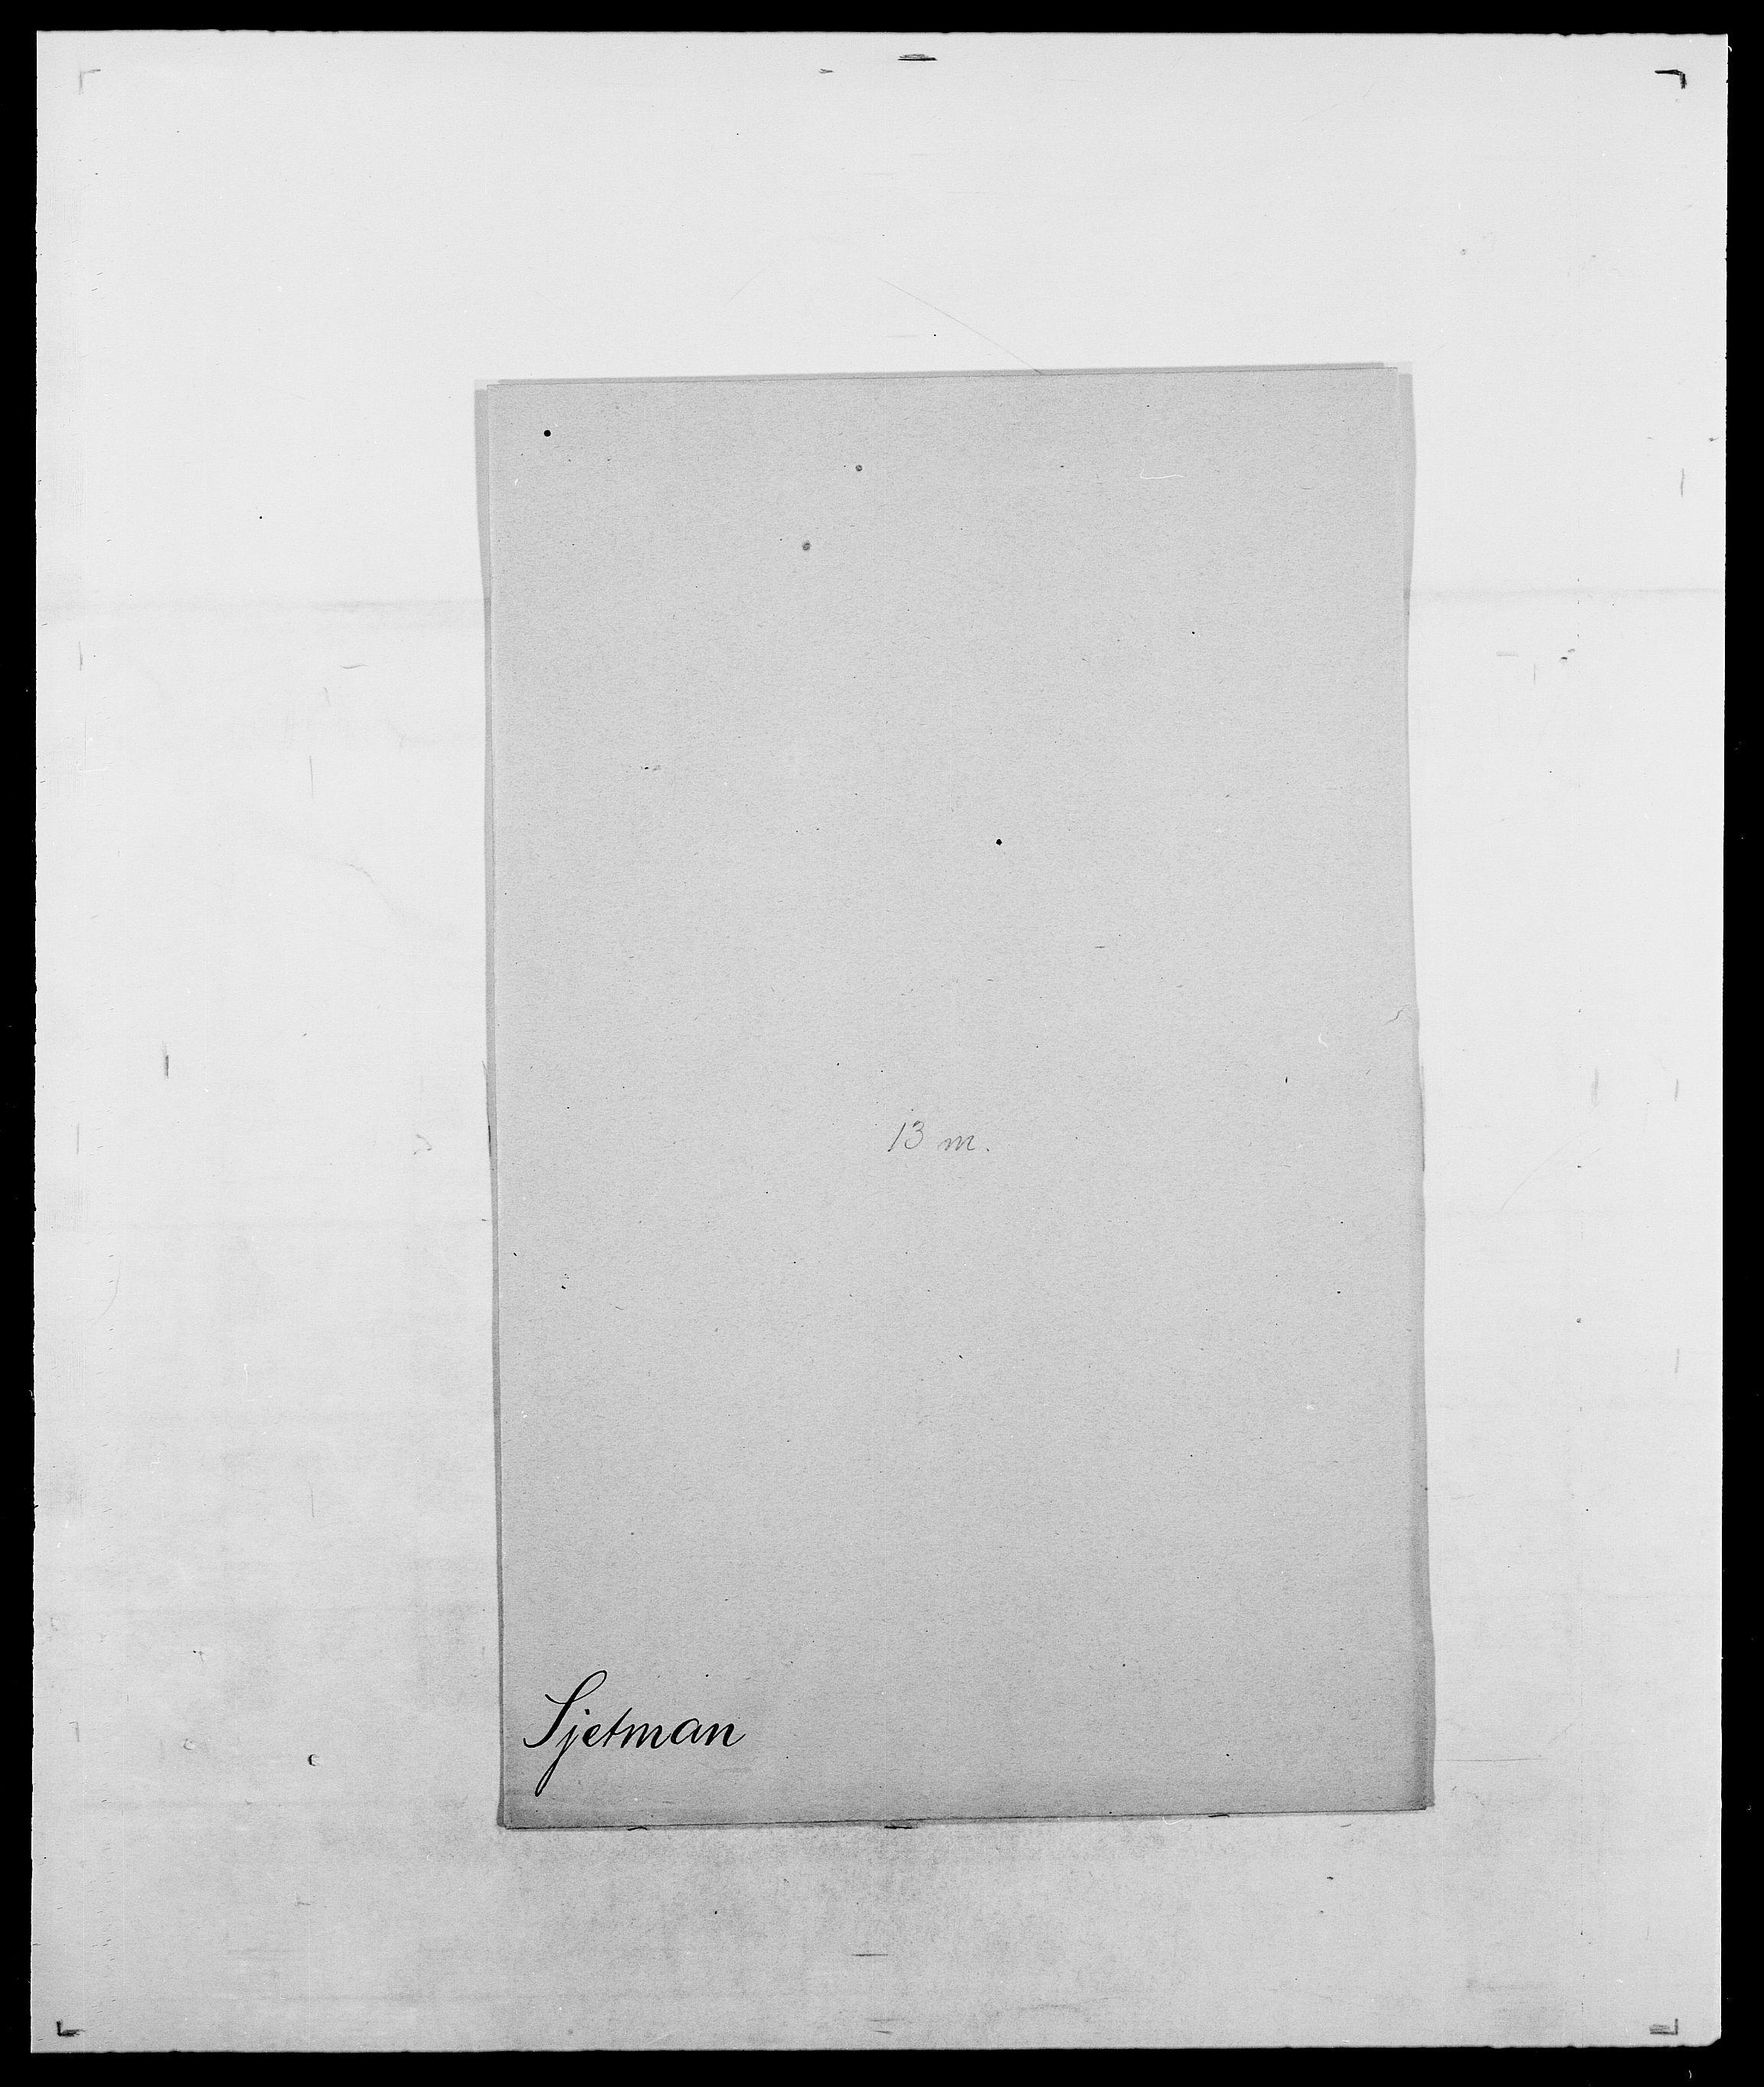 SAO, Delgobe, Charles Antoine - samling, D/Da/L0035: Schnabel - sjetman, s. 995